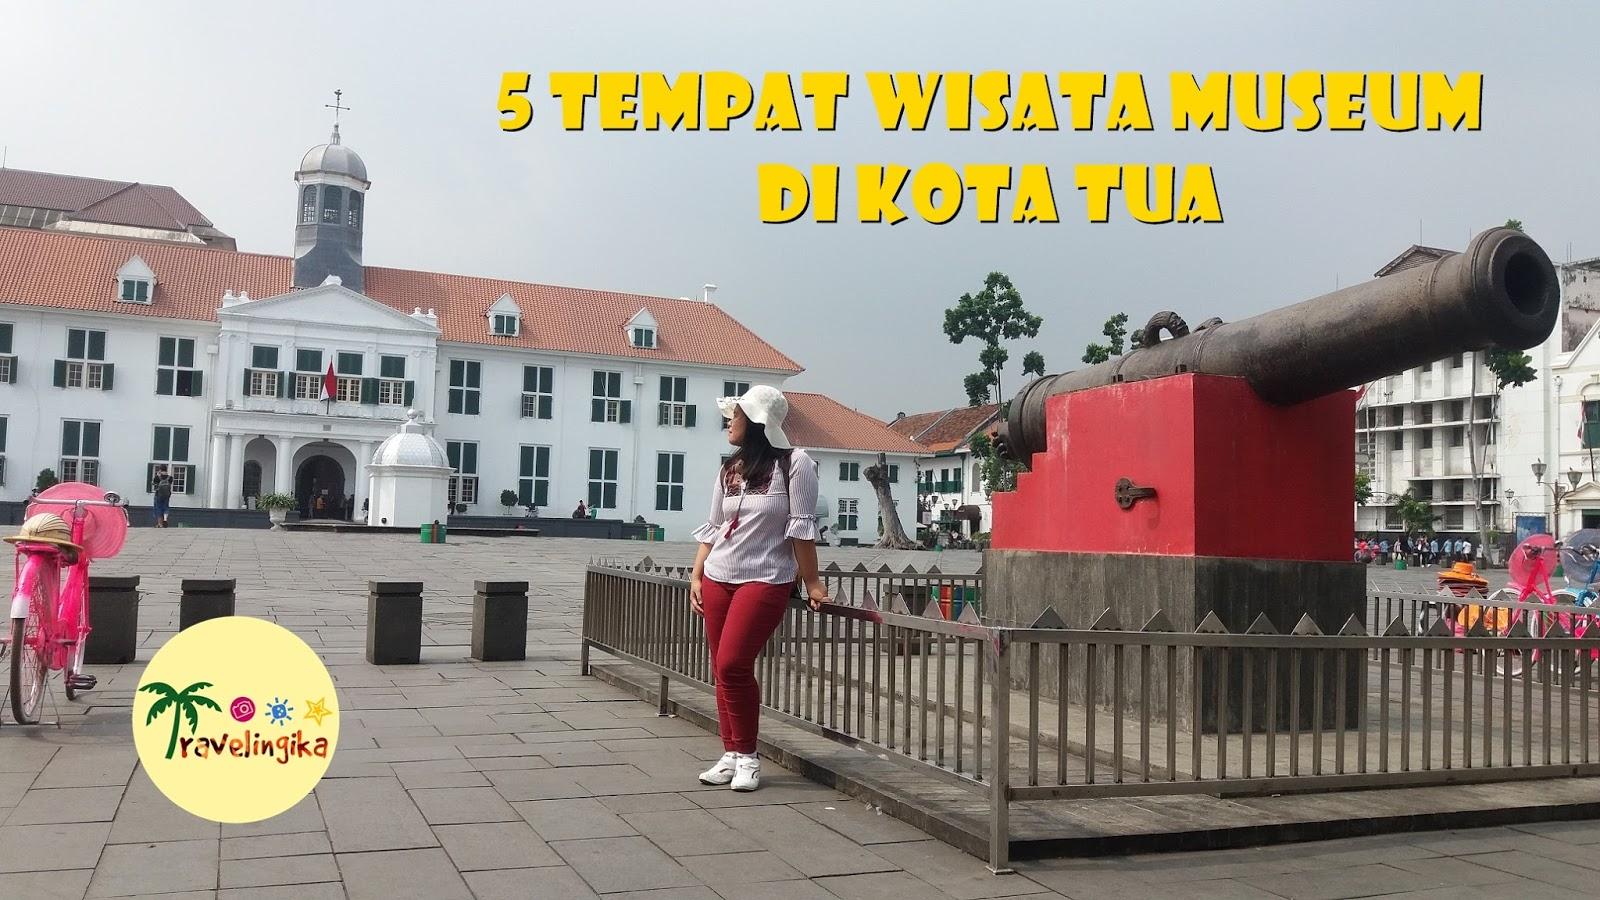 5 Tempat Wisata Museum Di Kota Tua Jakarta Catatan